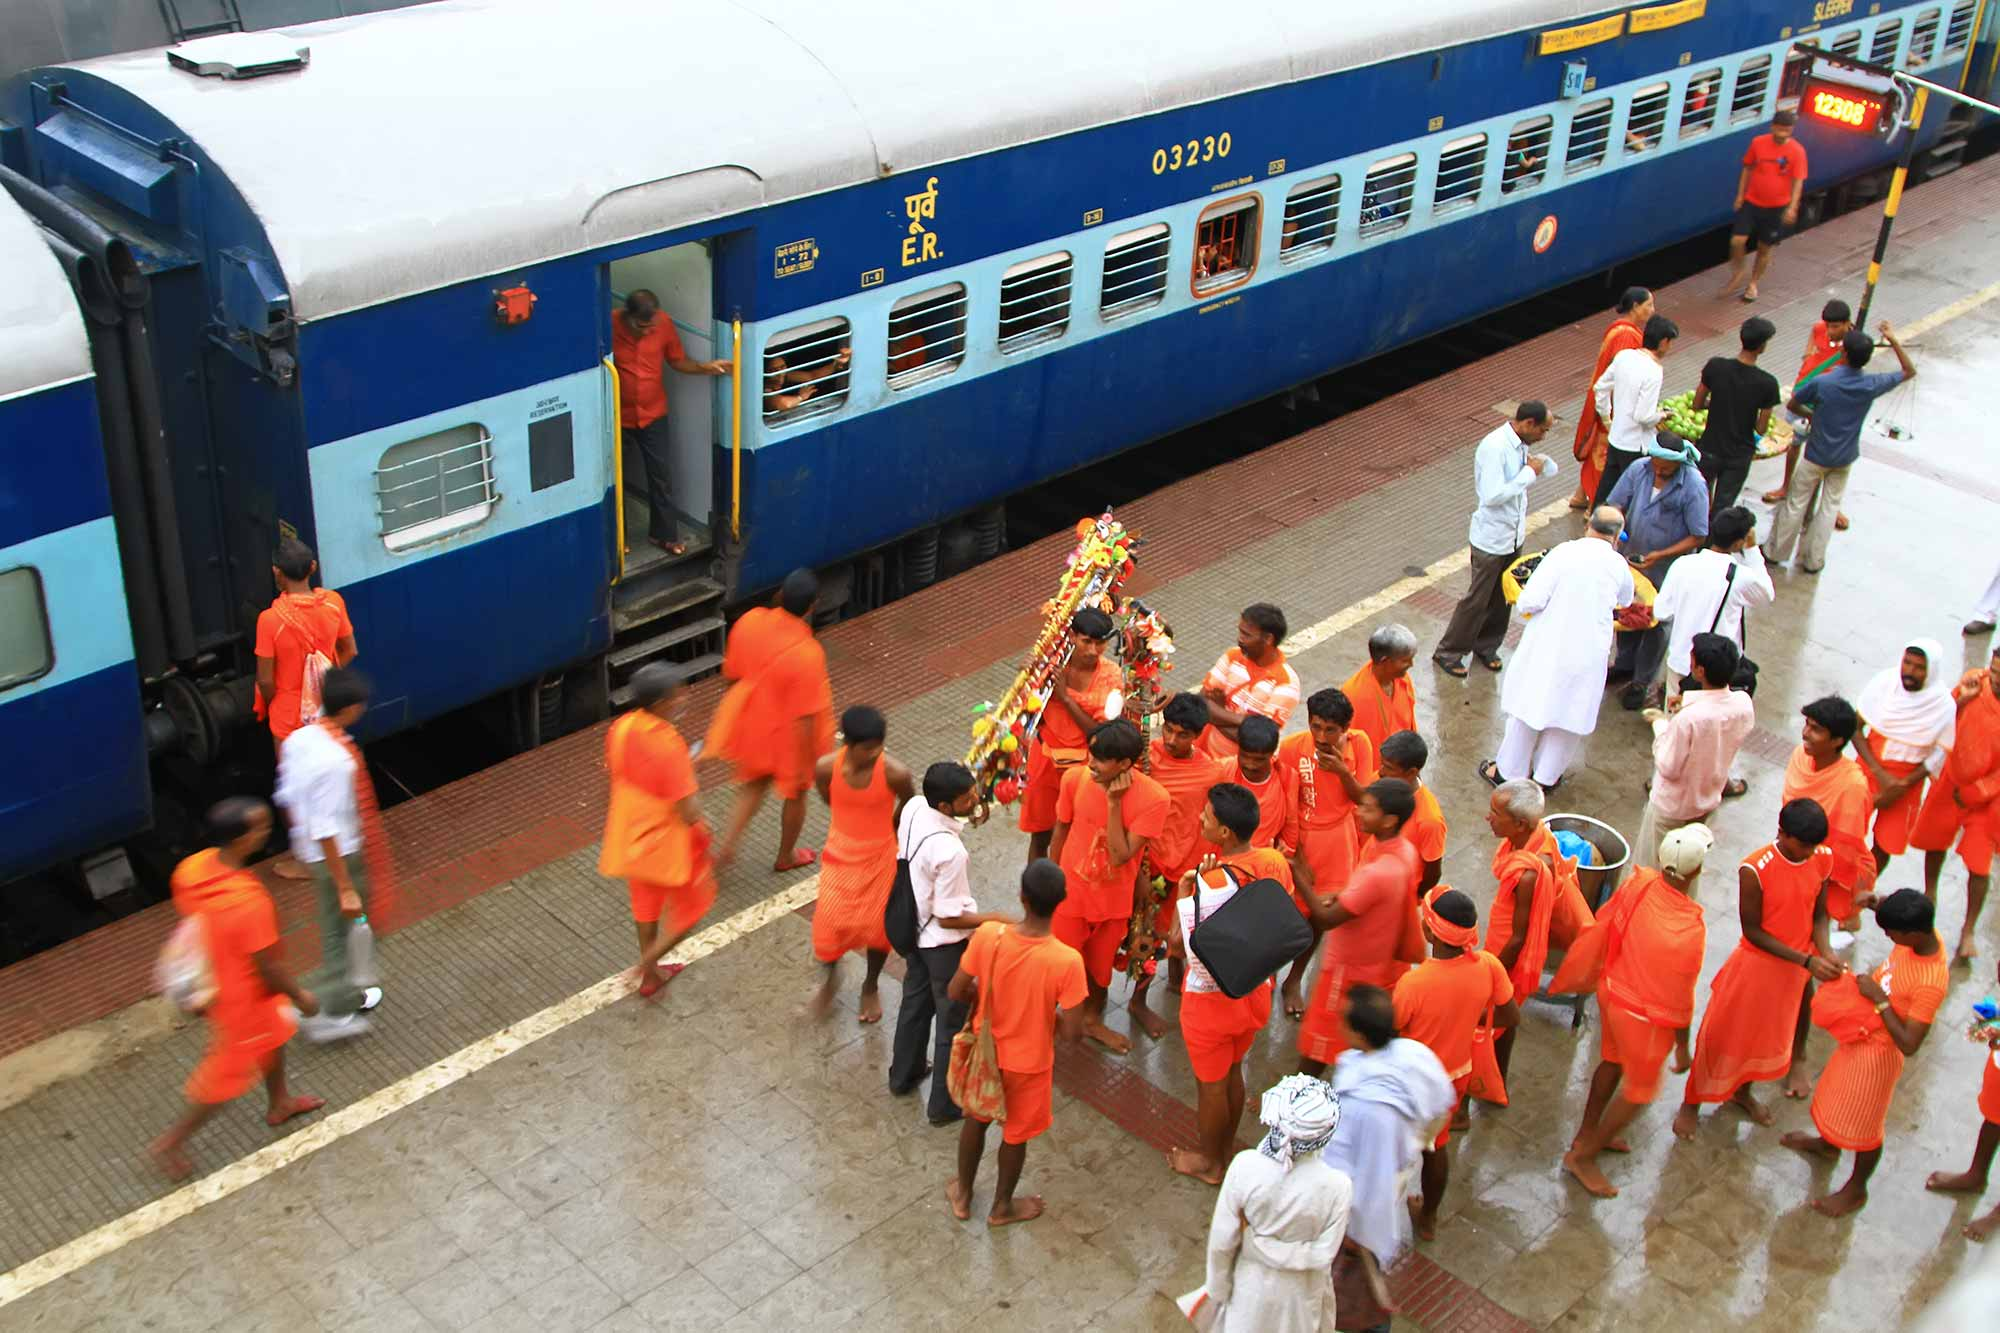 varanasi-train-station-hindus-india